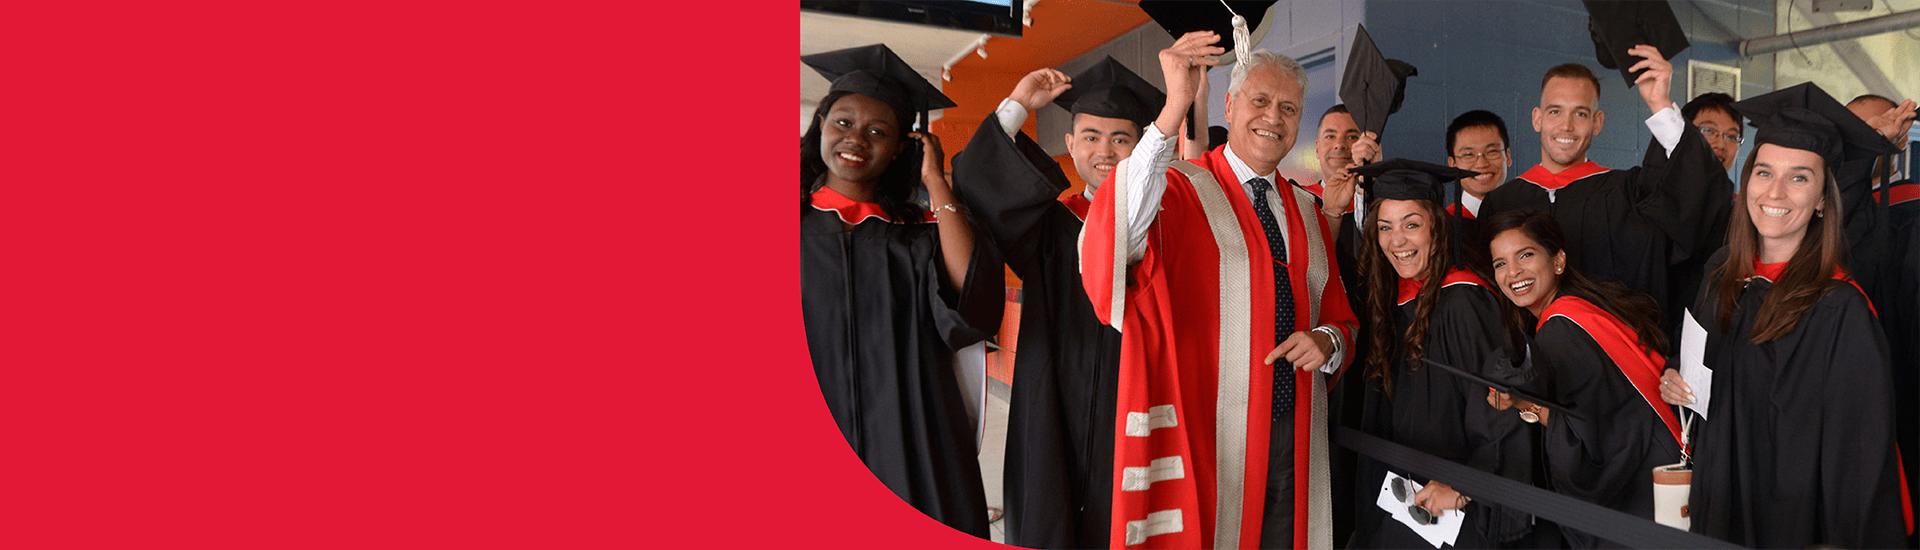 Congratulations to York University